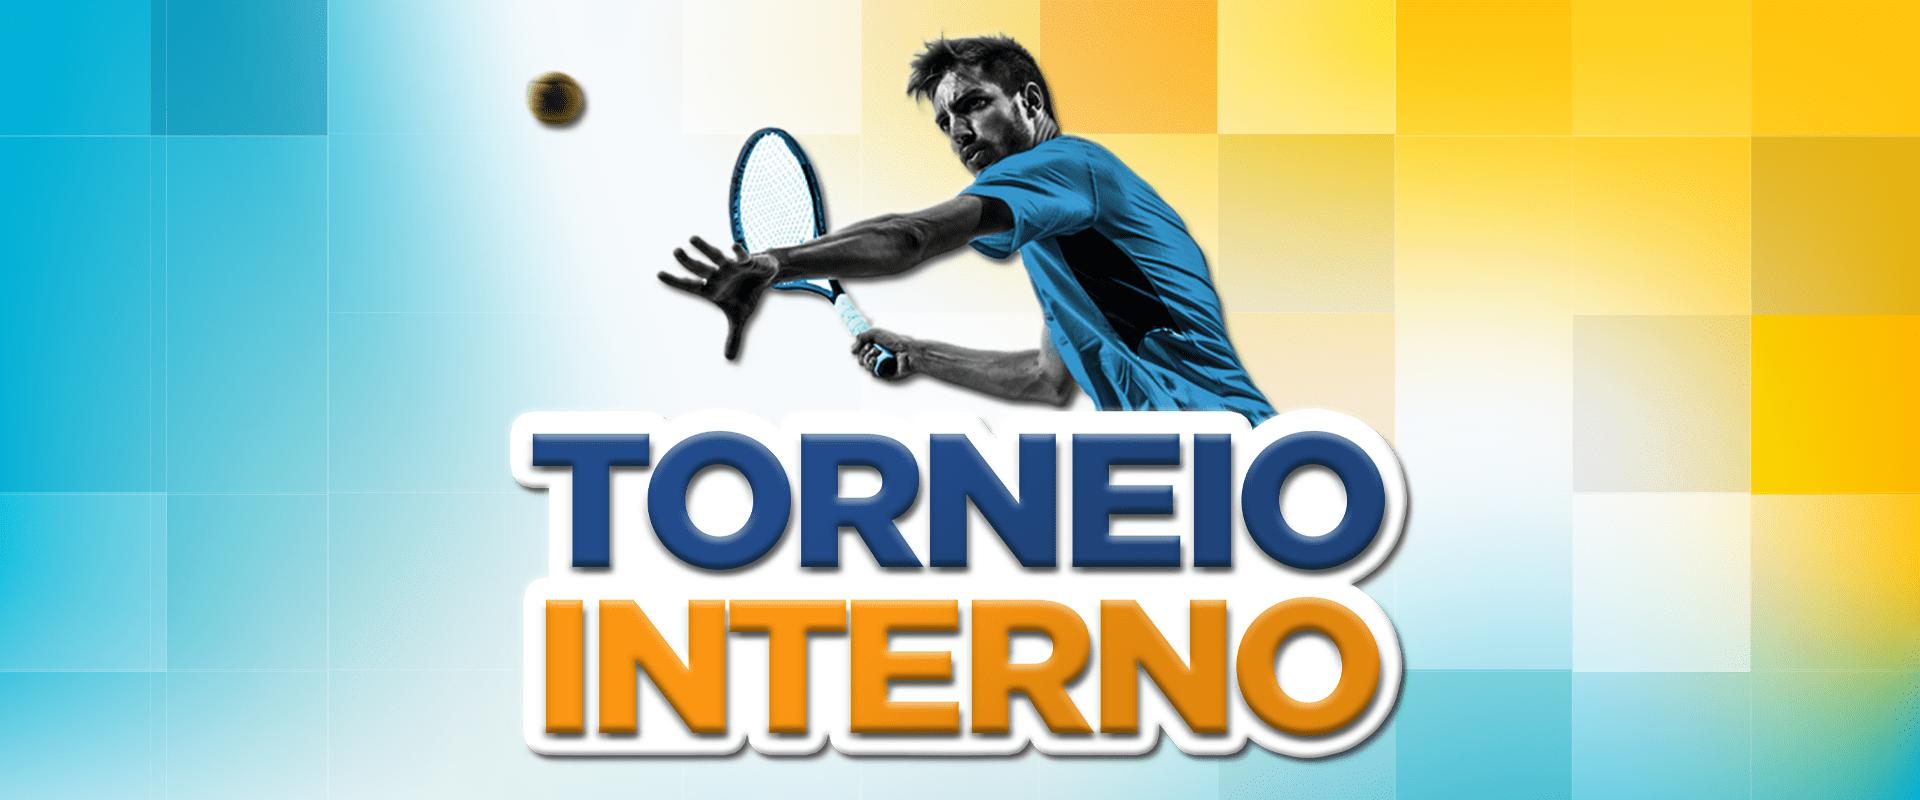 site_torneio interno tênis_banner